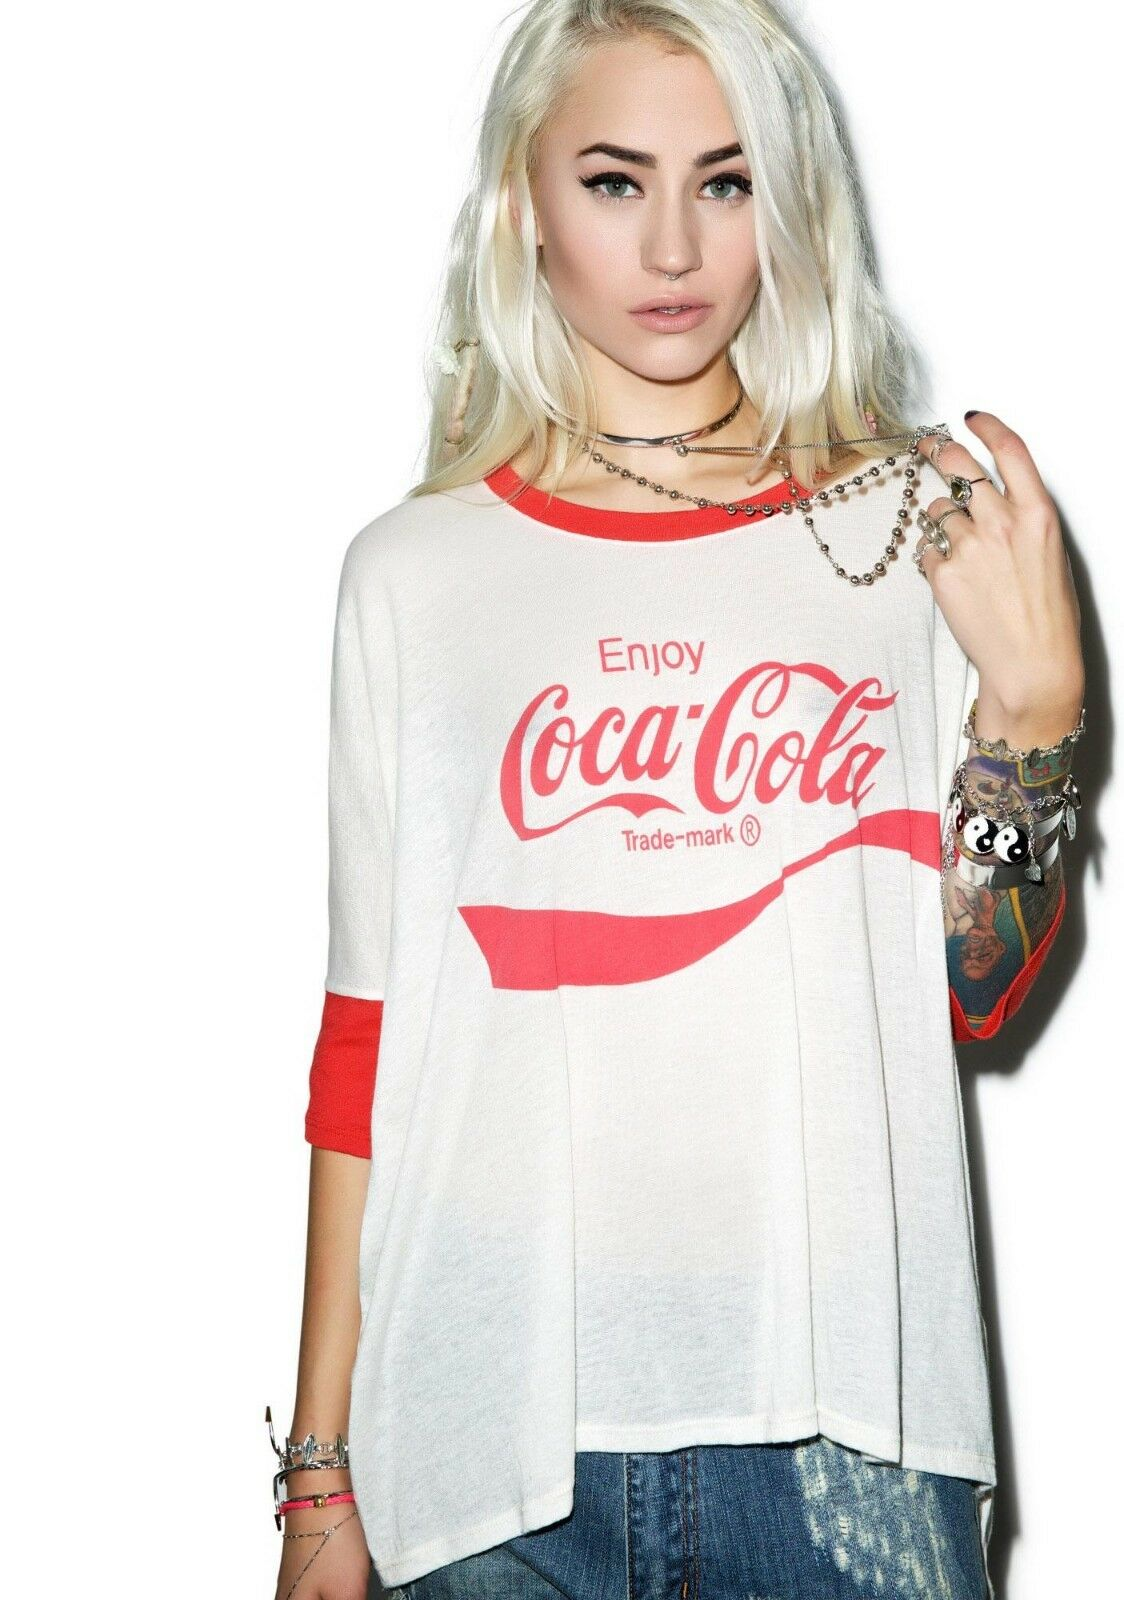 Wildfox women's t shirt, coca cola sunny morning, oversized, tee, s. xs, s, m